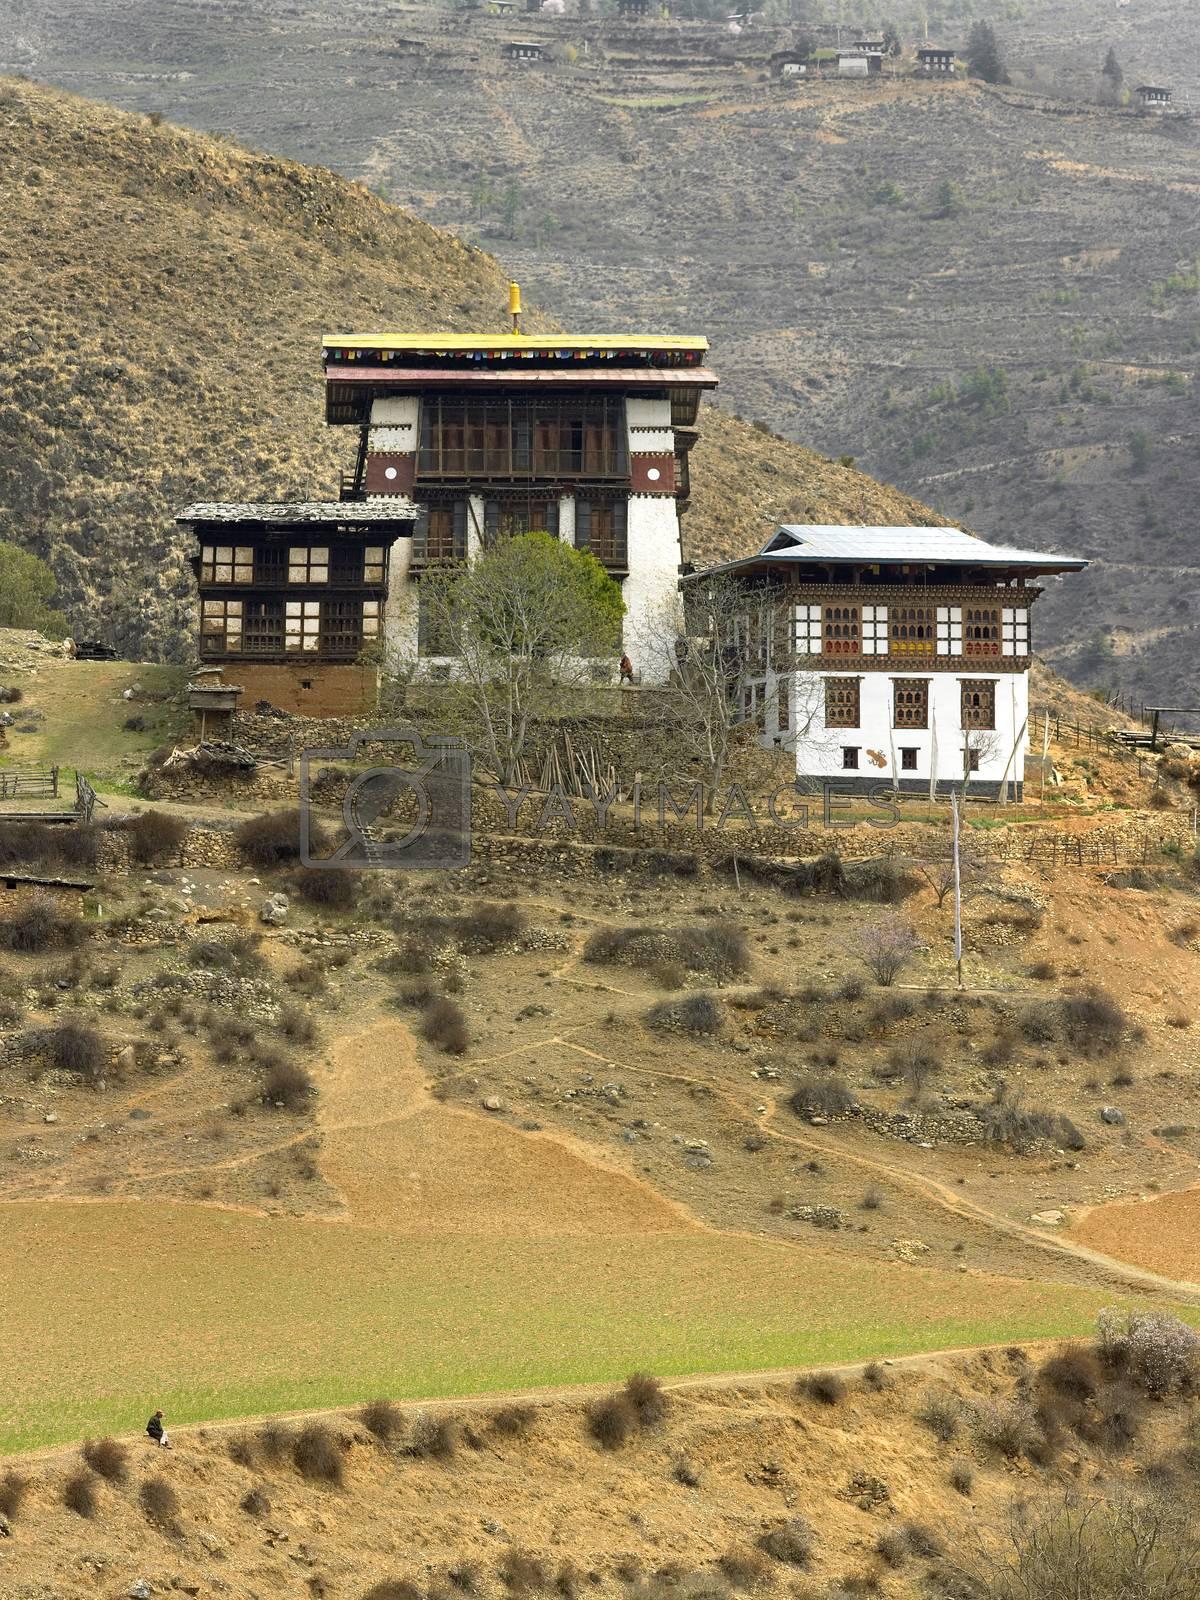 Royalty free image of Kingdom of Bhutan by SteveAllenPhoto